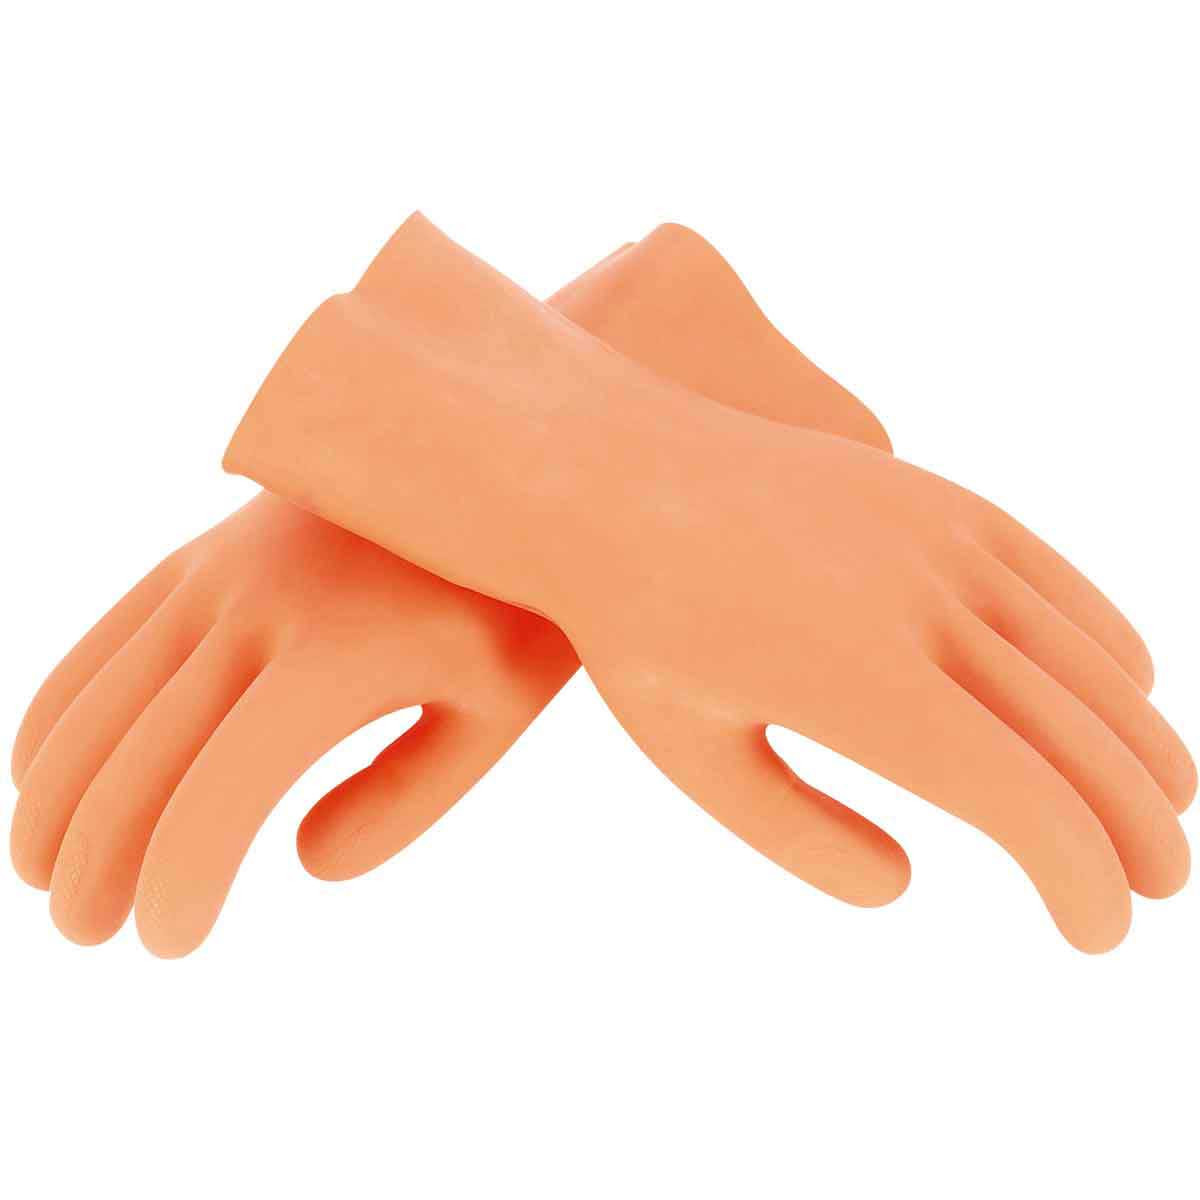 QEP Heavy Duty XL Grouting Gloves